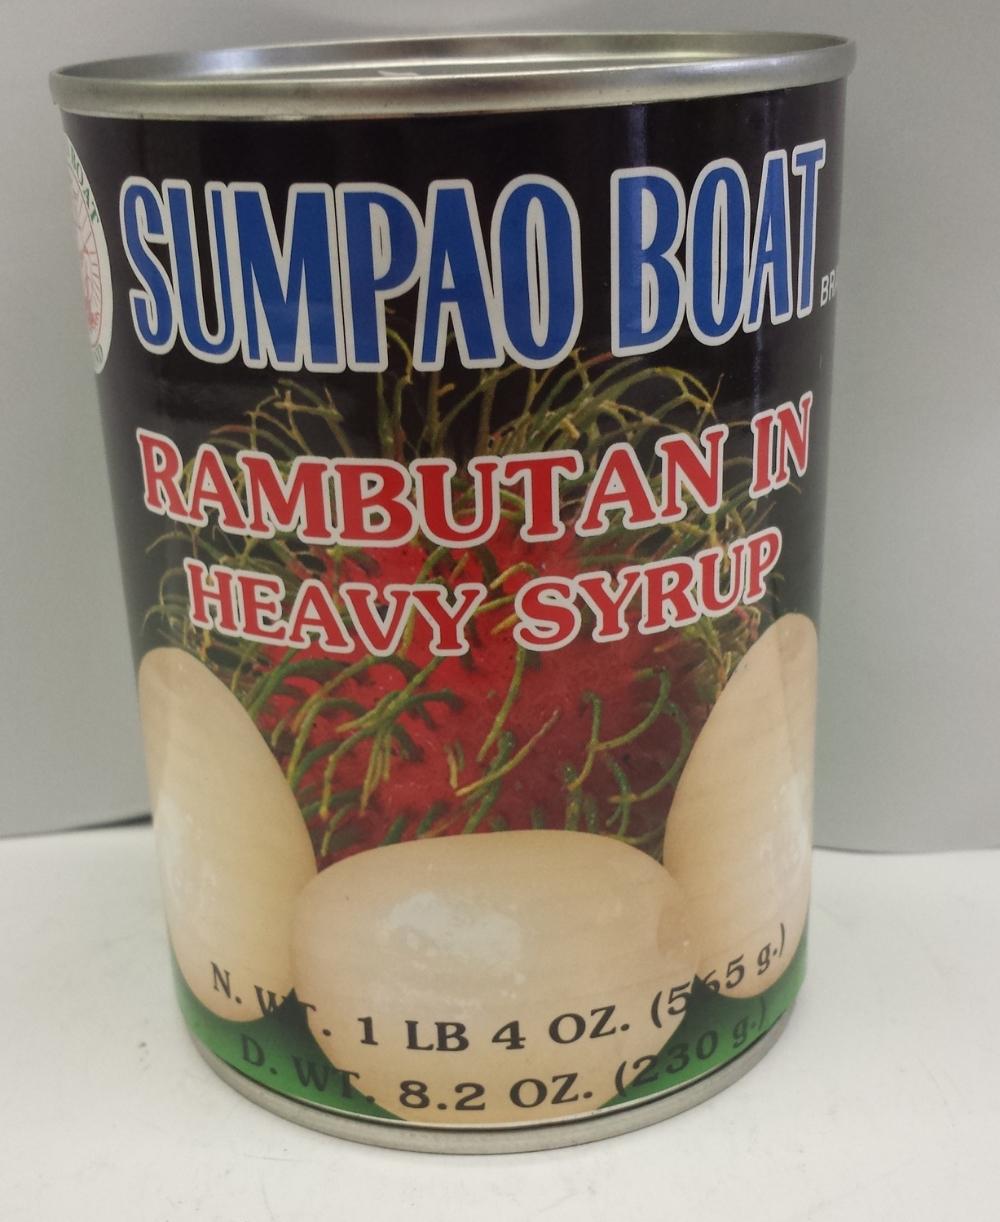 Rambutan in Heavy Syrup    Sumpao Boat   FC16297 24x20 oz